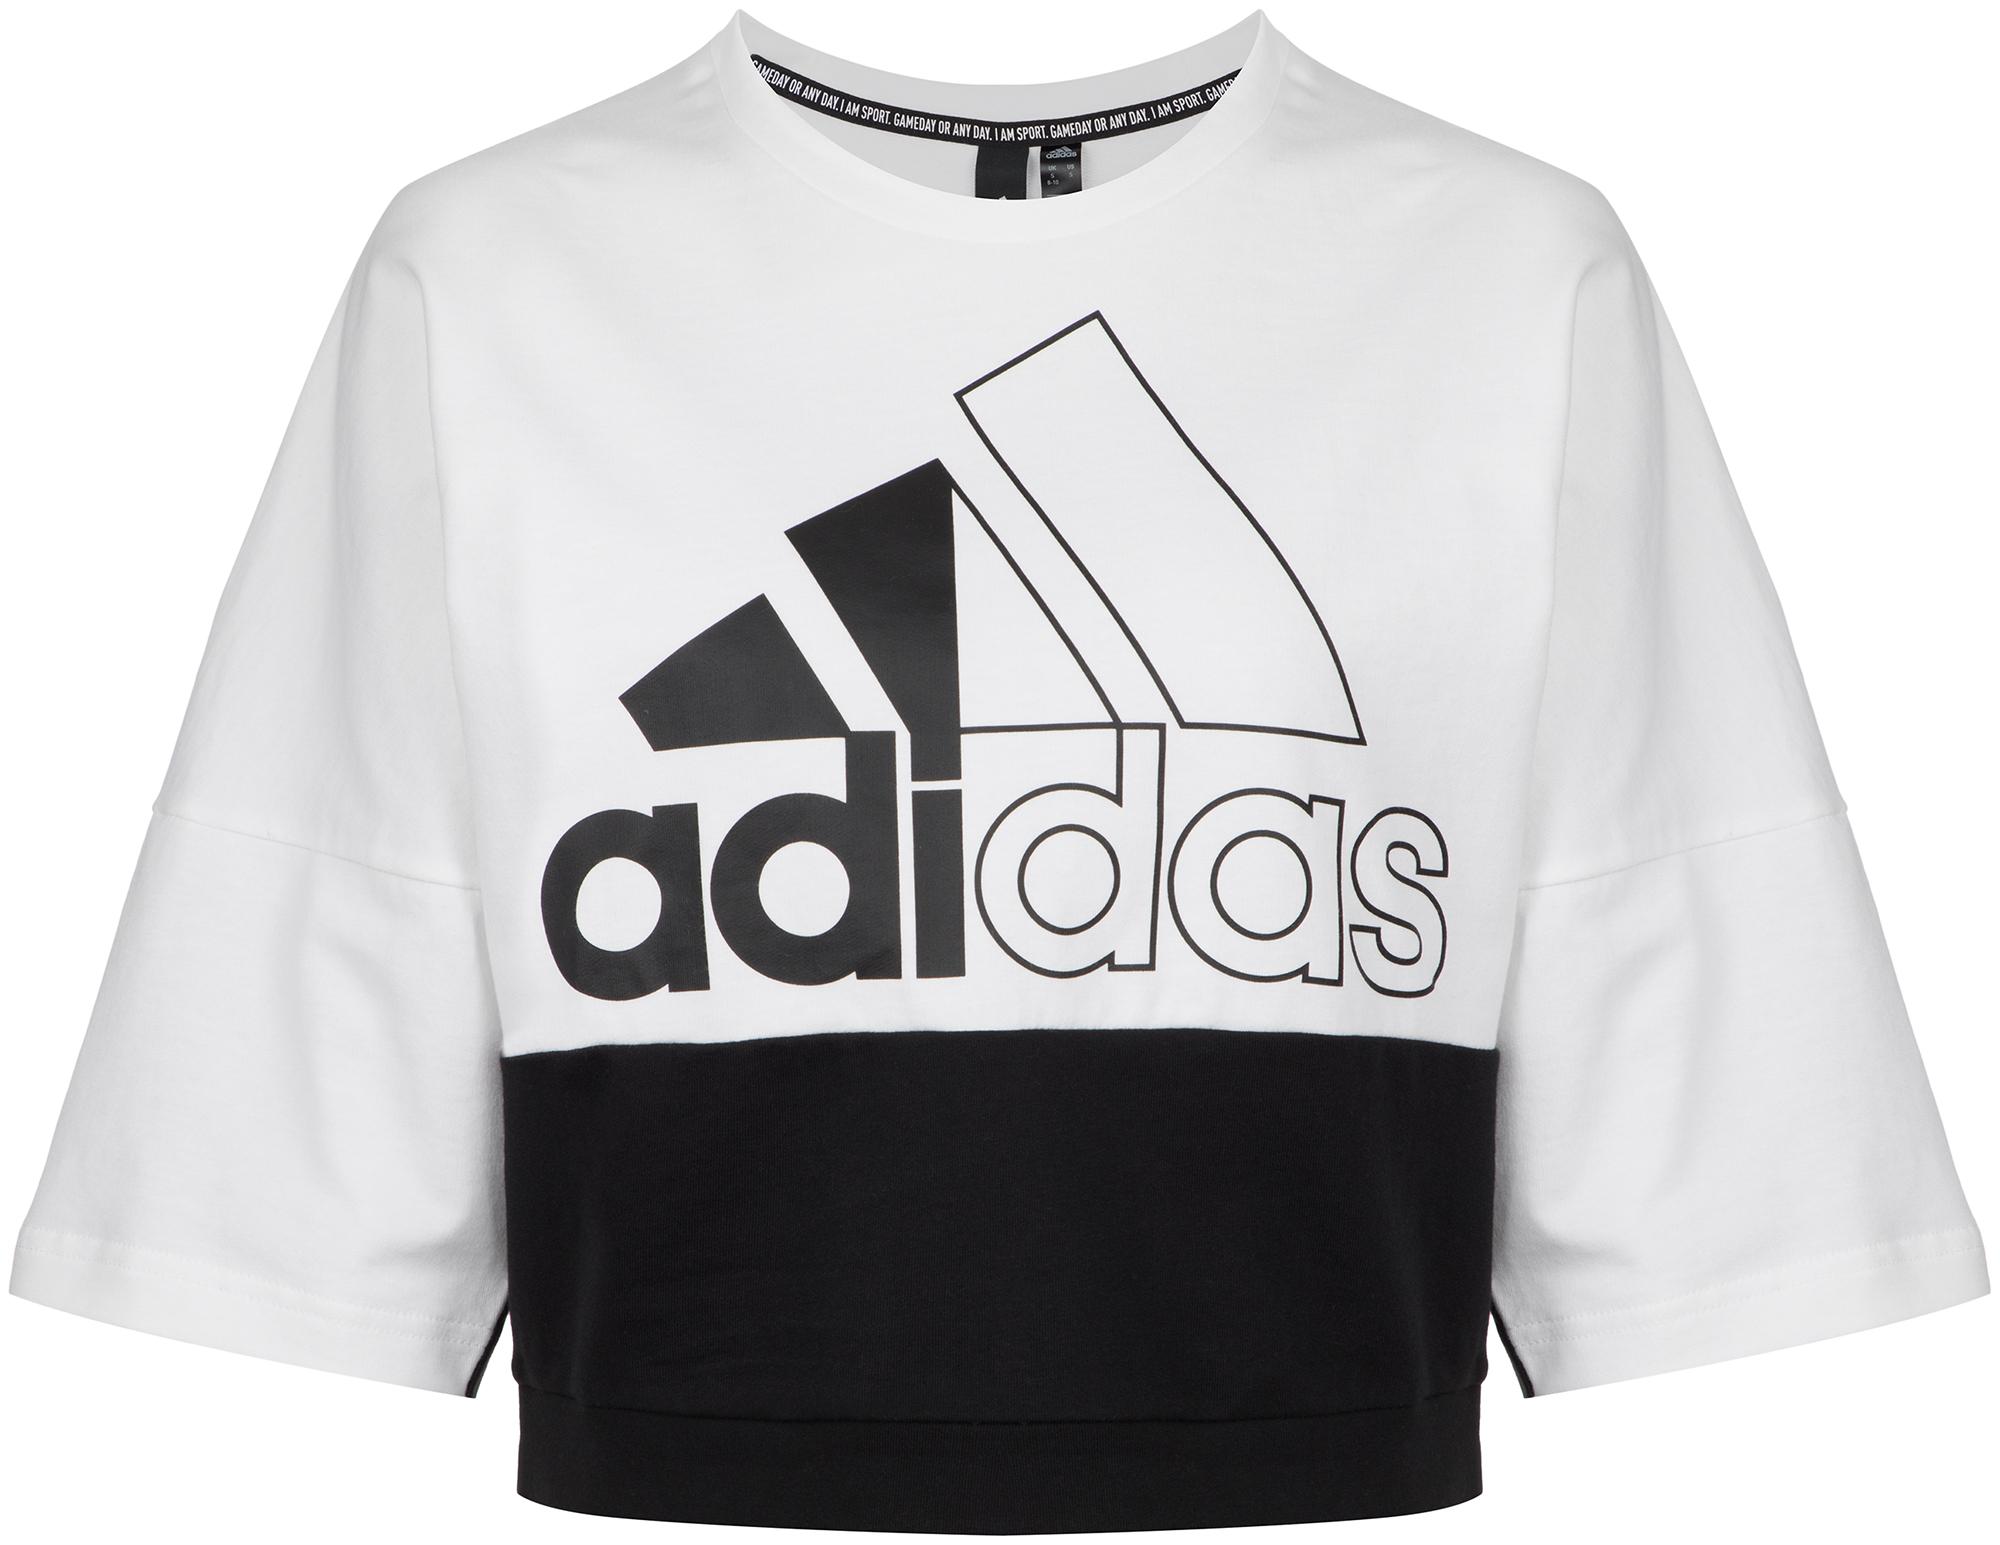 Adidas Футболка женская Adidas, размер 42-44